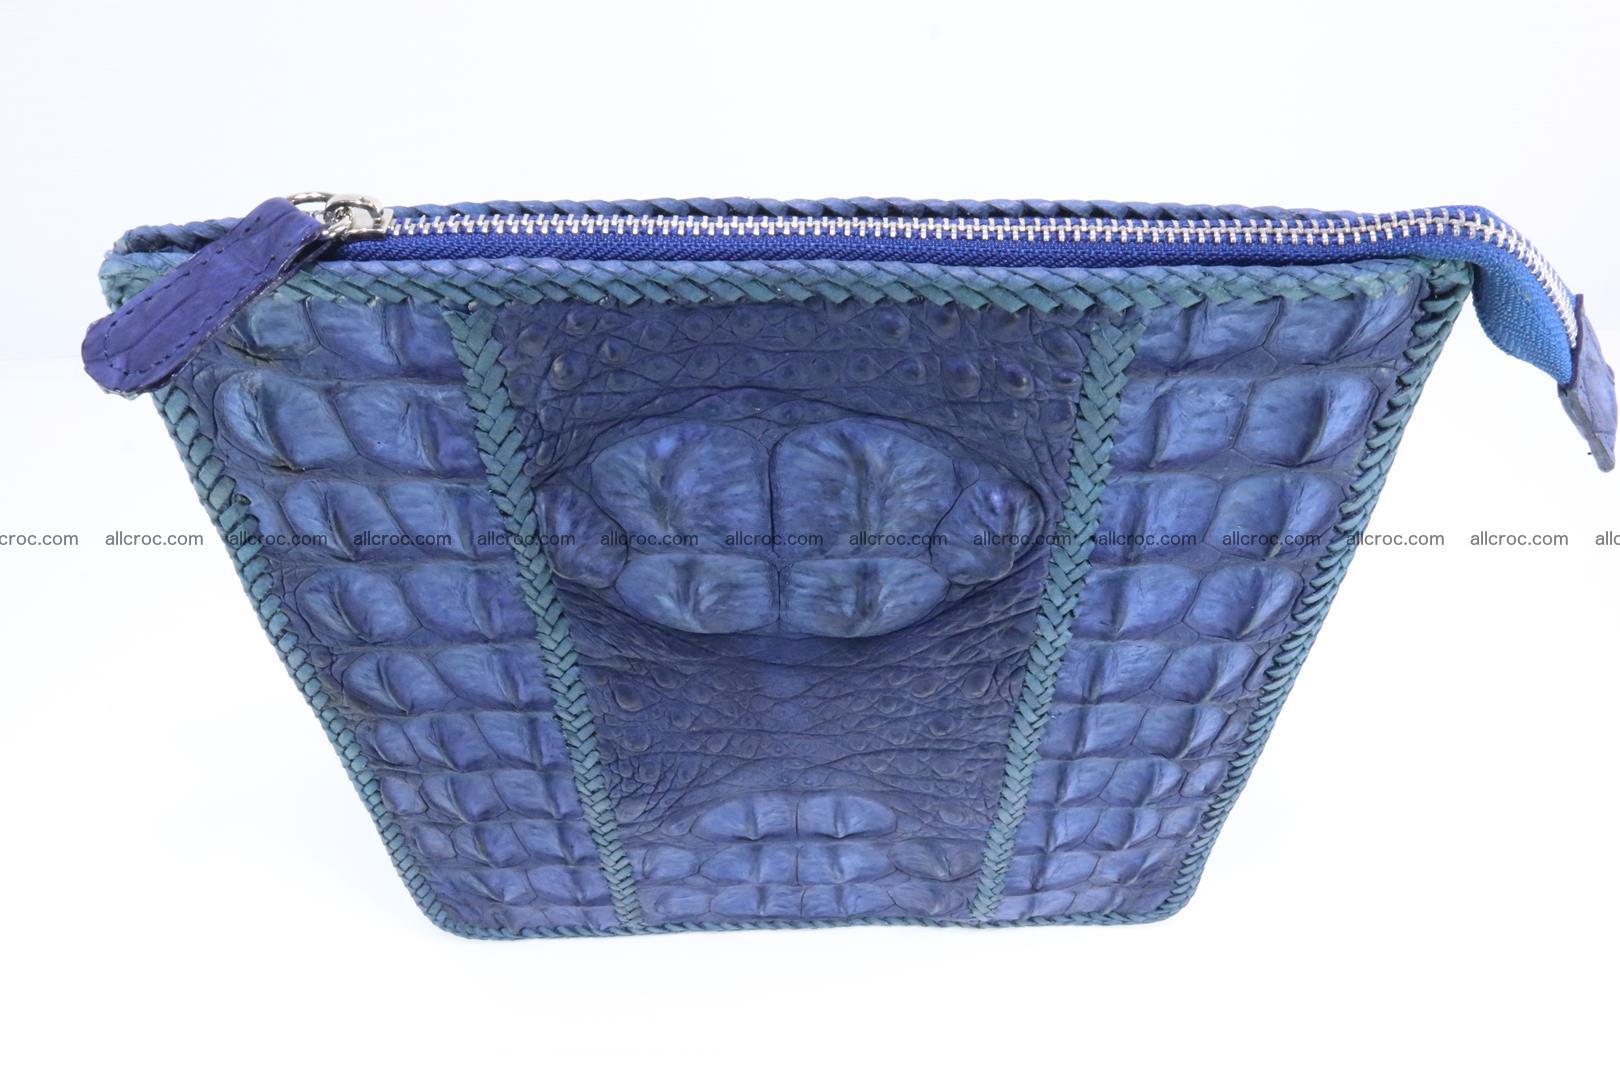 Crocodile skin shoulder bag hand braided edges 128 Foto 4